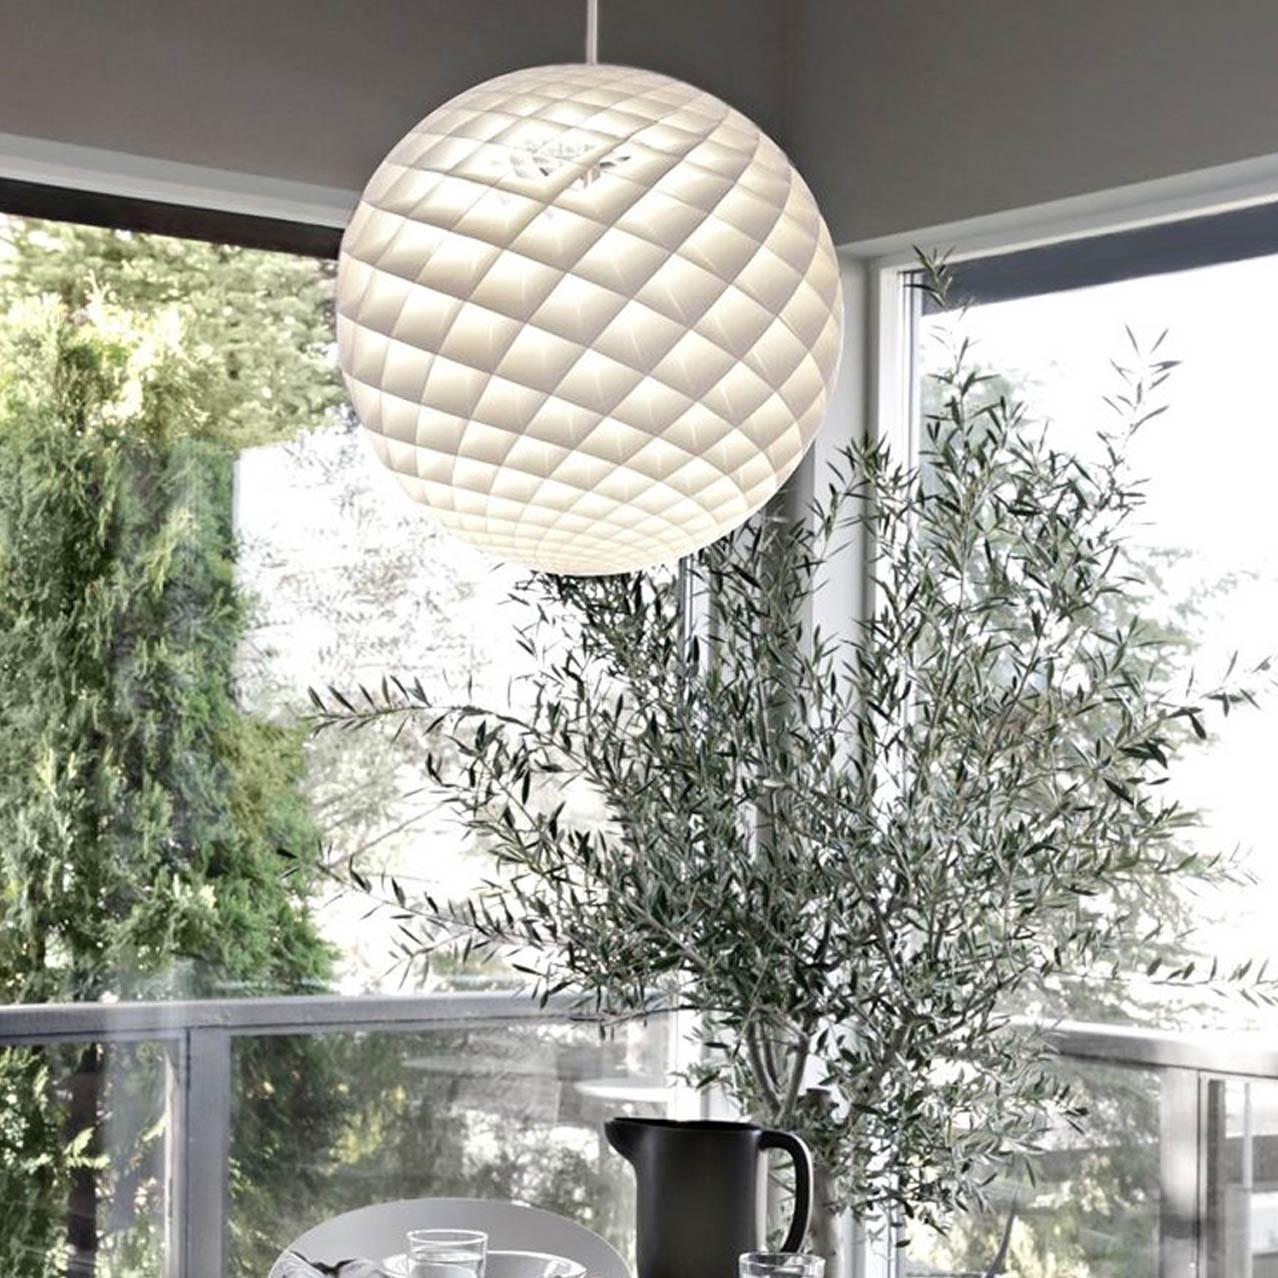 louis-poulsen-pendant-light.jpg